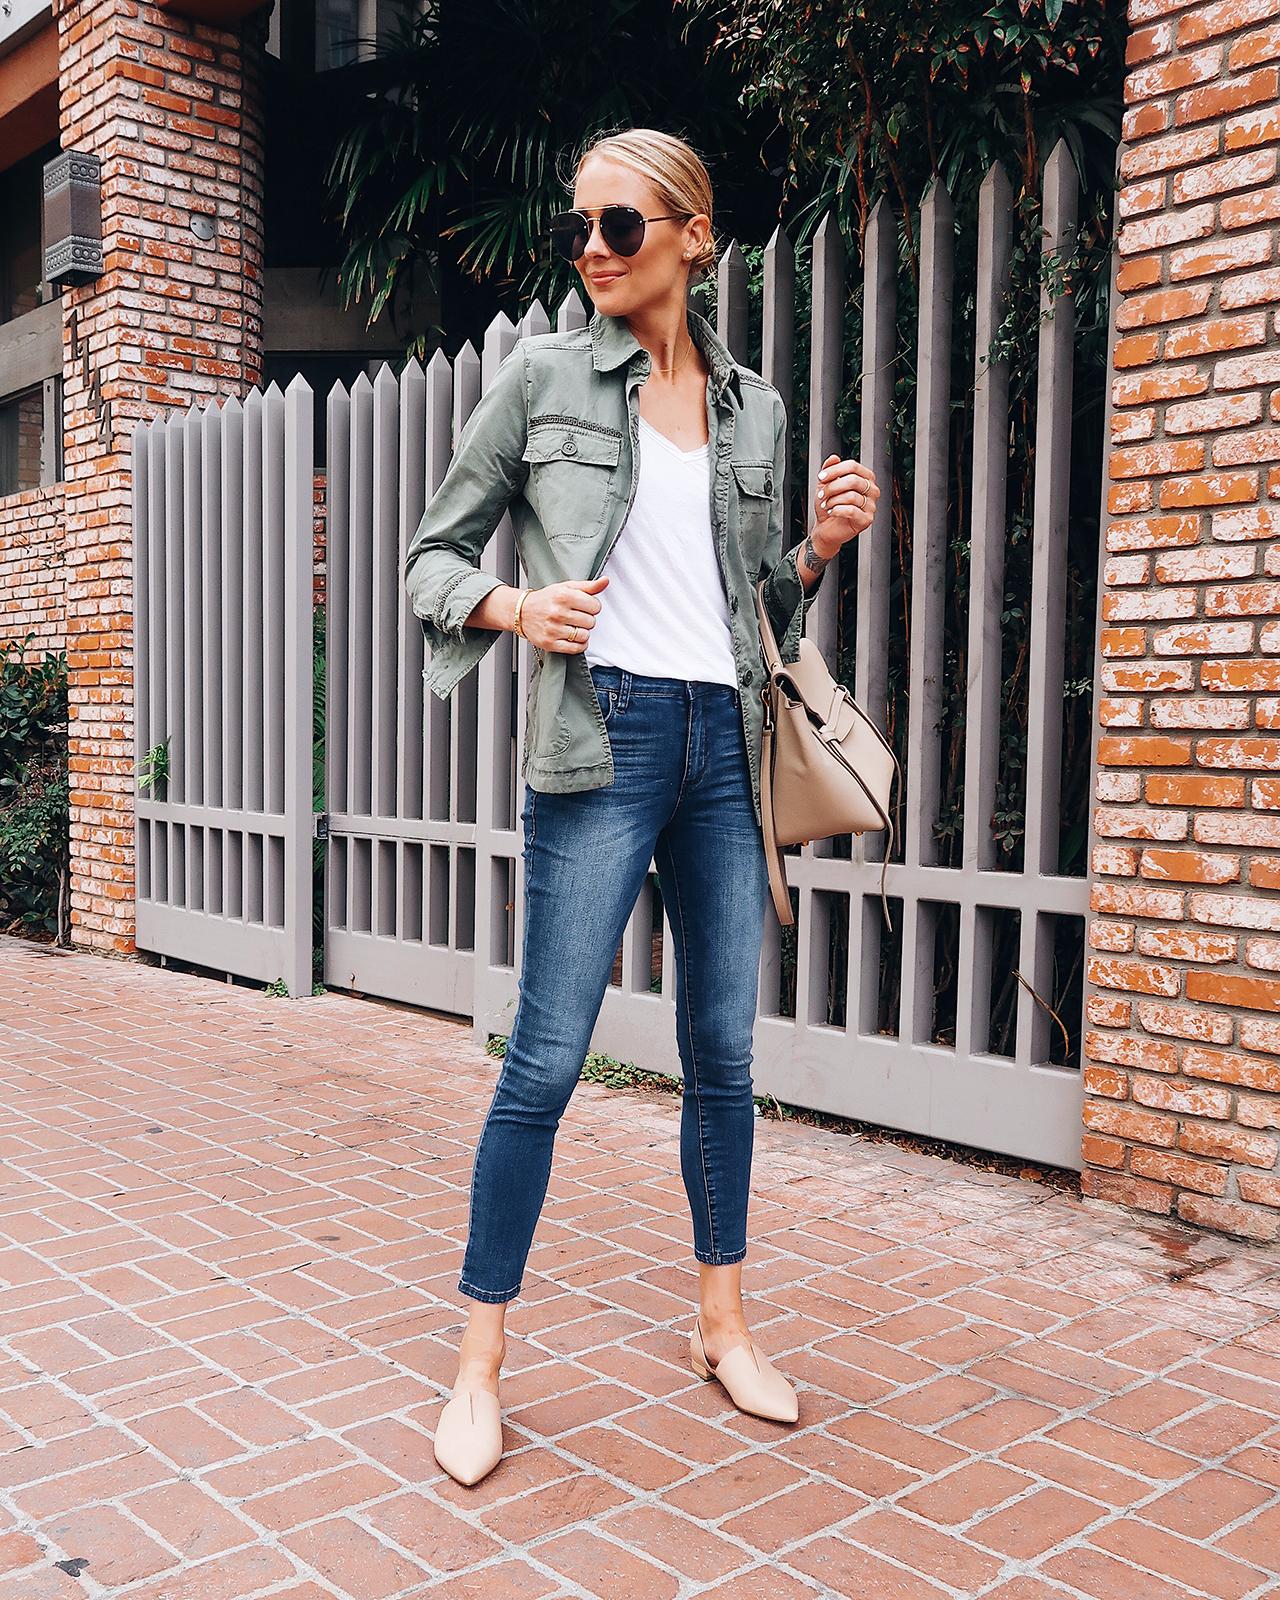 Fashion Jackson Wearing Green Utility Jacket White Tshirt Denim Skinny Jeans Nude Flats